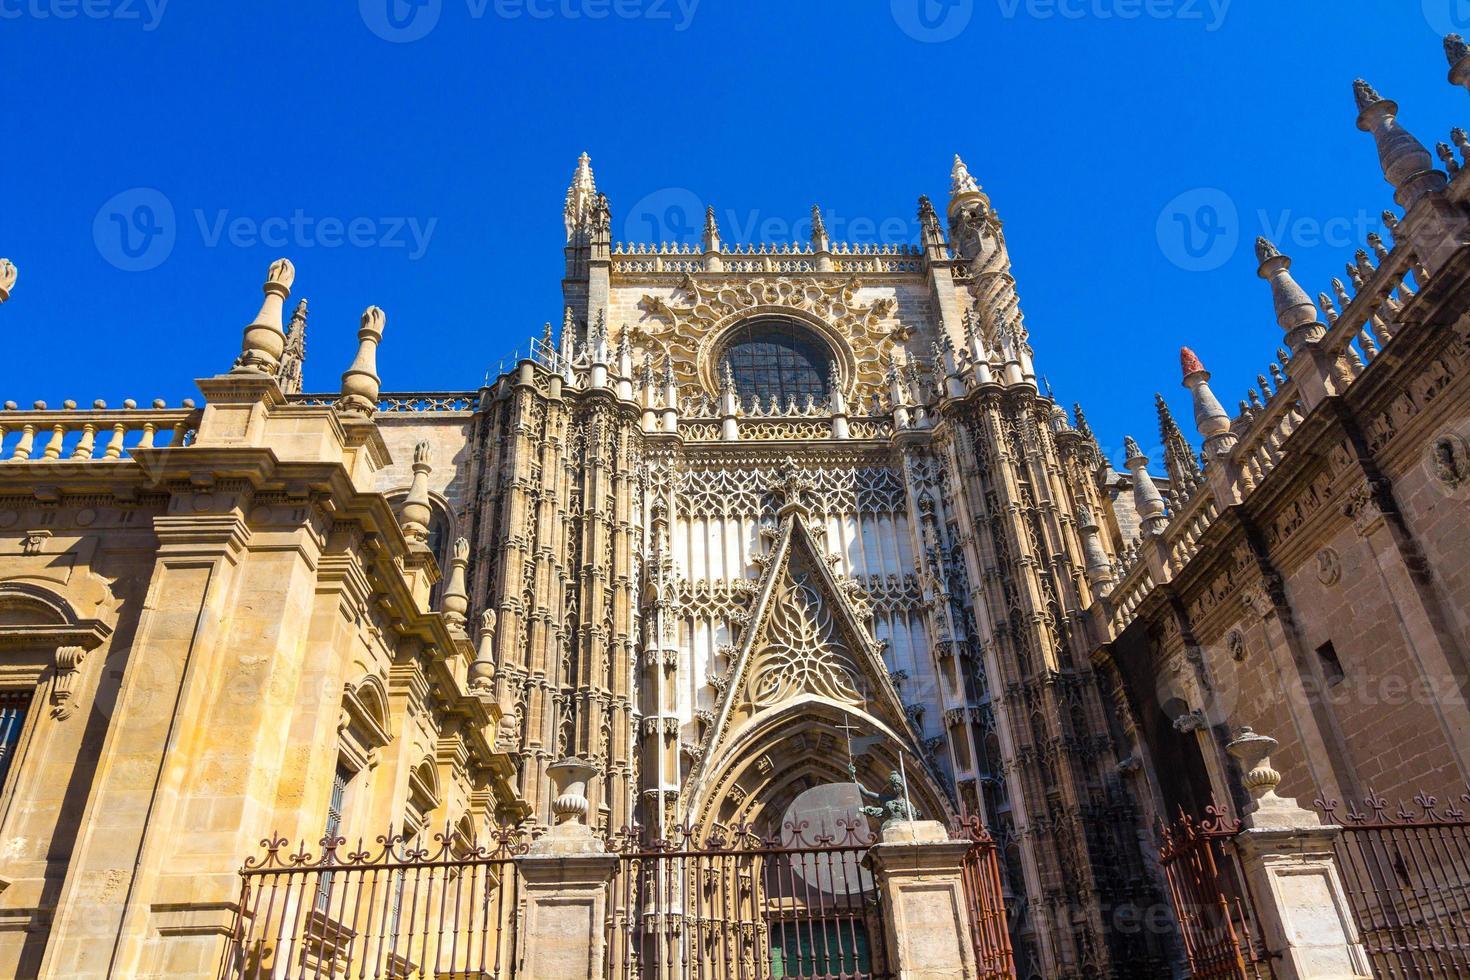 Details der Fassade der Kathedrale Santa Maria La Giralda foto